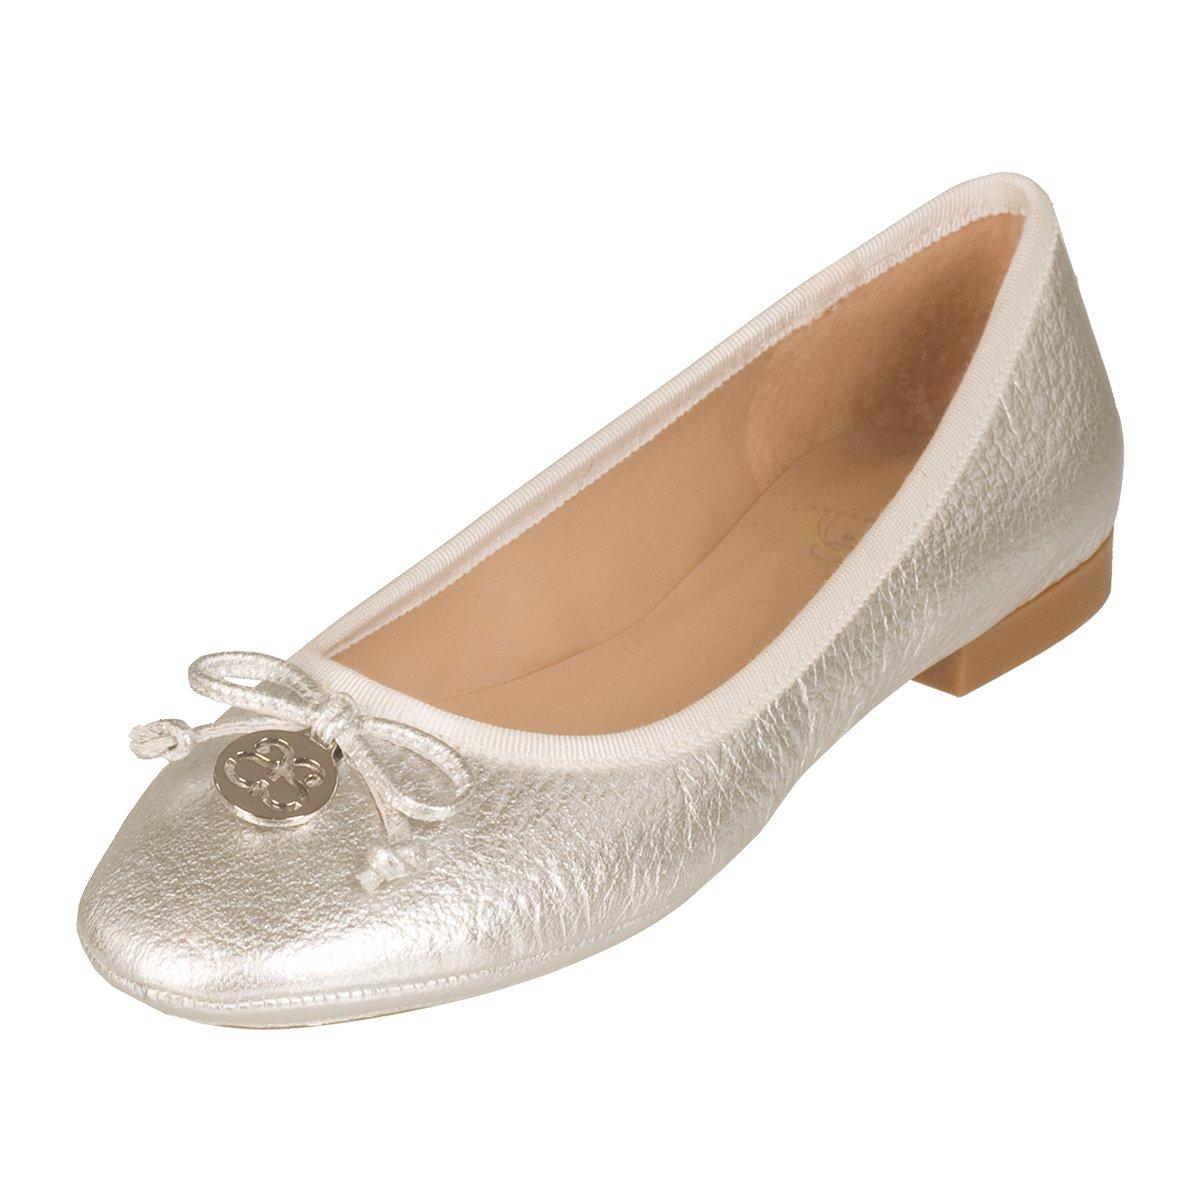 Andrew Stevens Women's Cara Bow Ballet Flat B077XP35JG 11 B(M) US|Silver